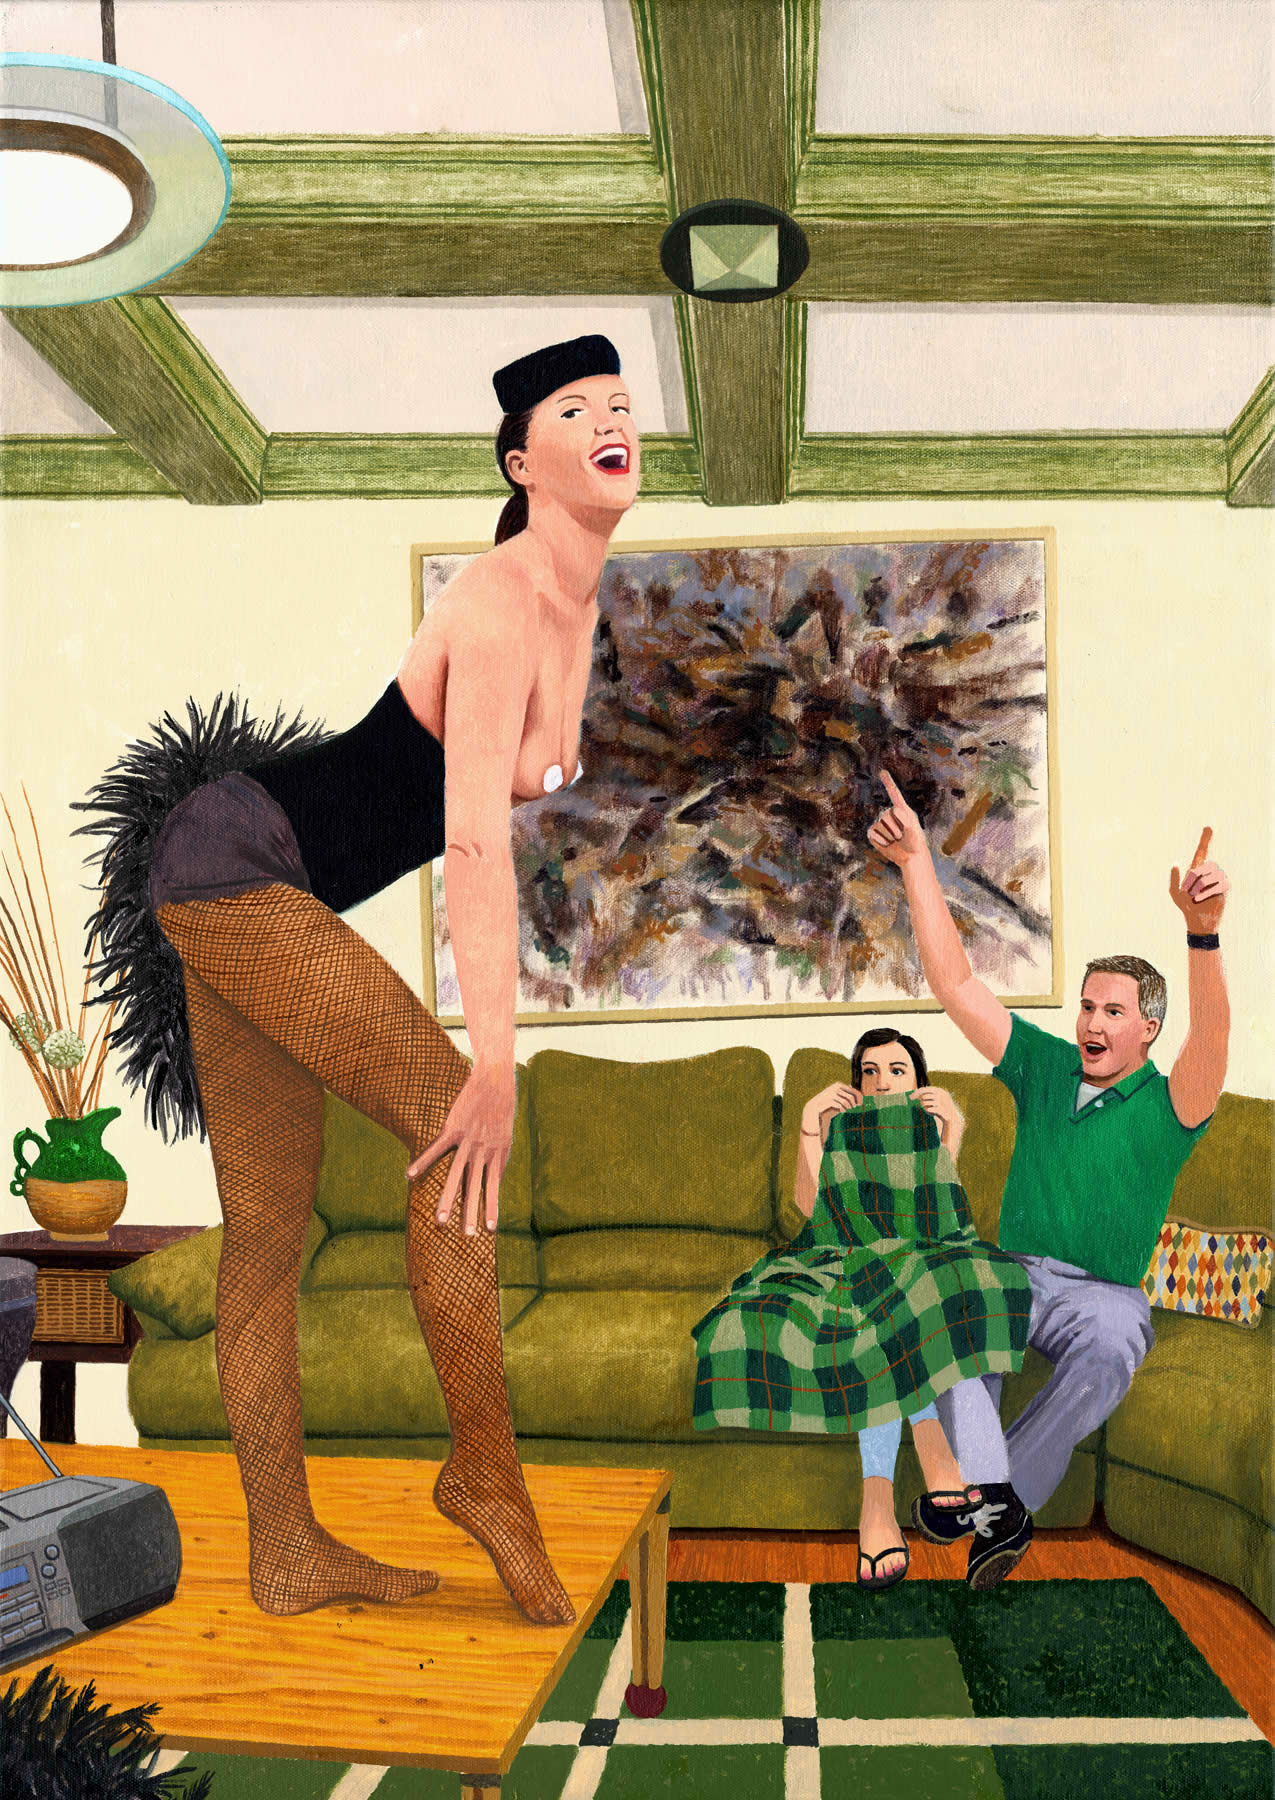 She Was Beginning to Think Their Burlesque Dancer Houseguest Wasn't the Best Idea